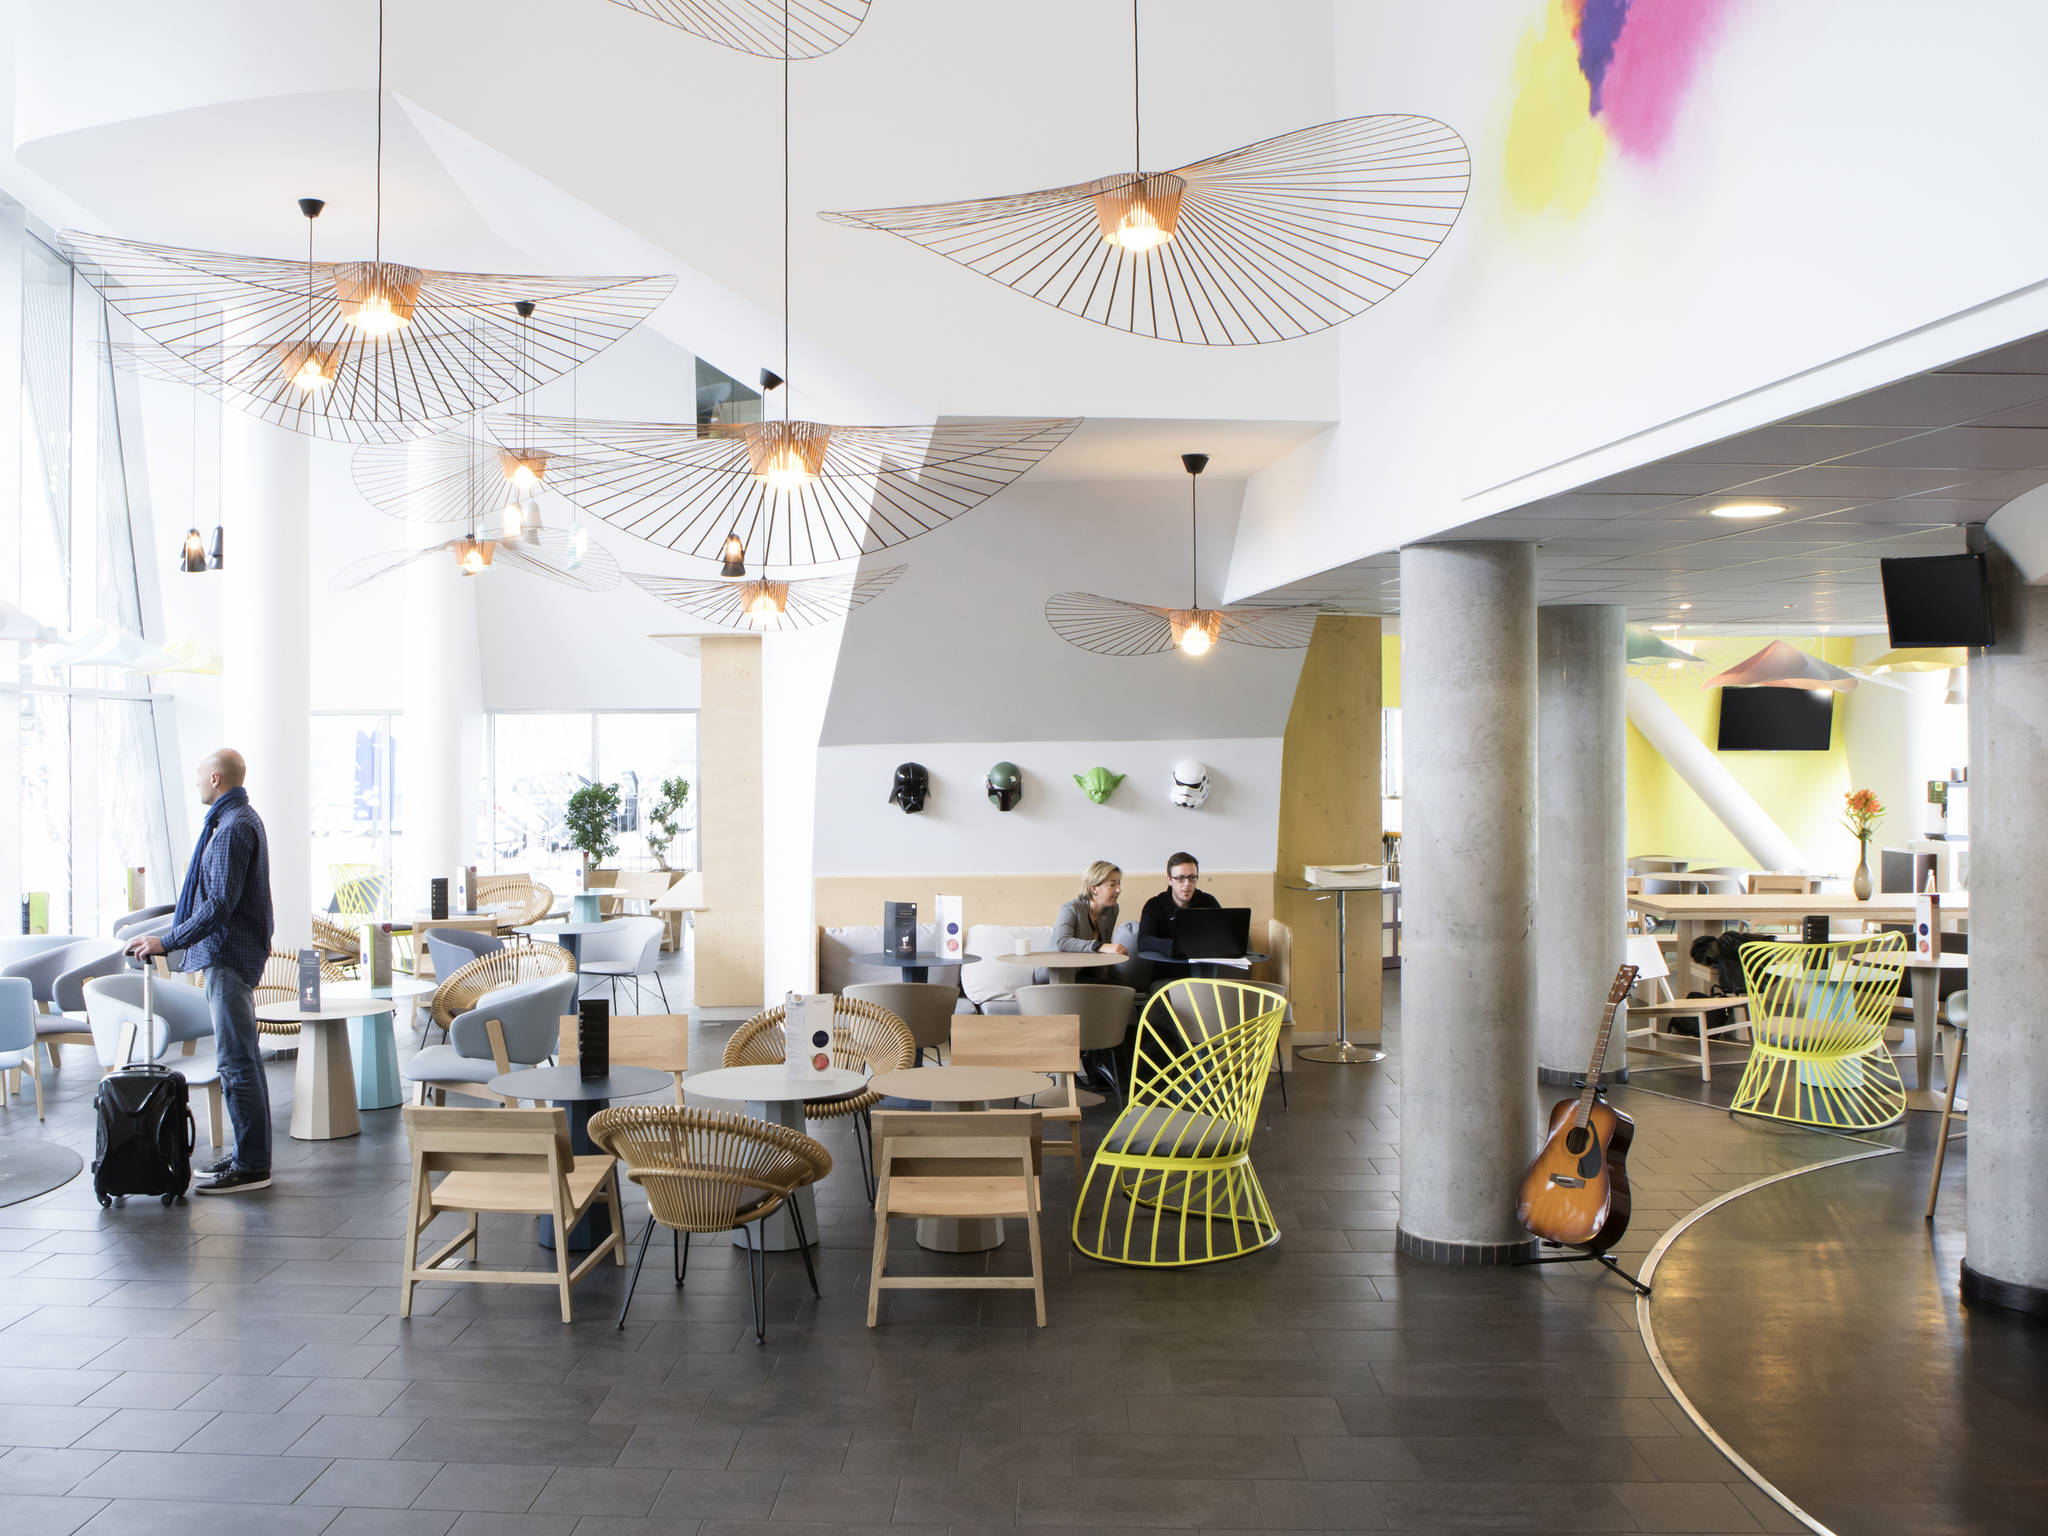 Otel – Novotel Suites Gare Lille Europe